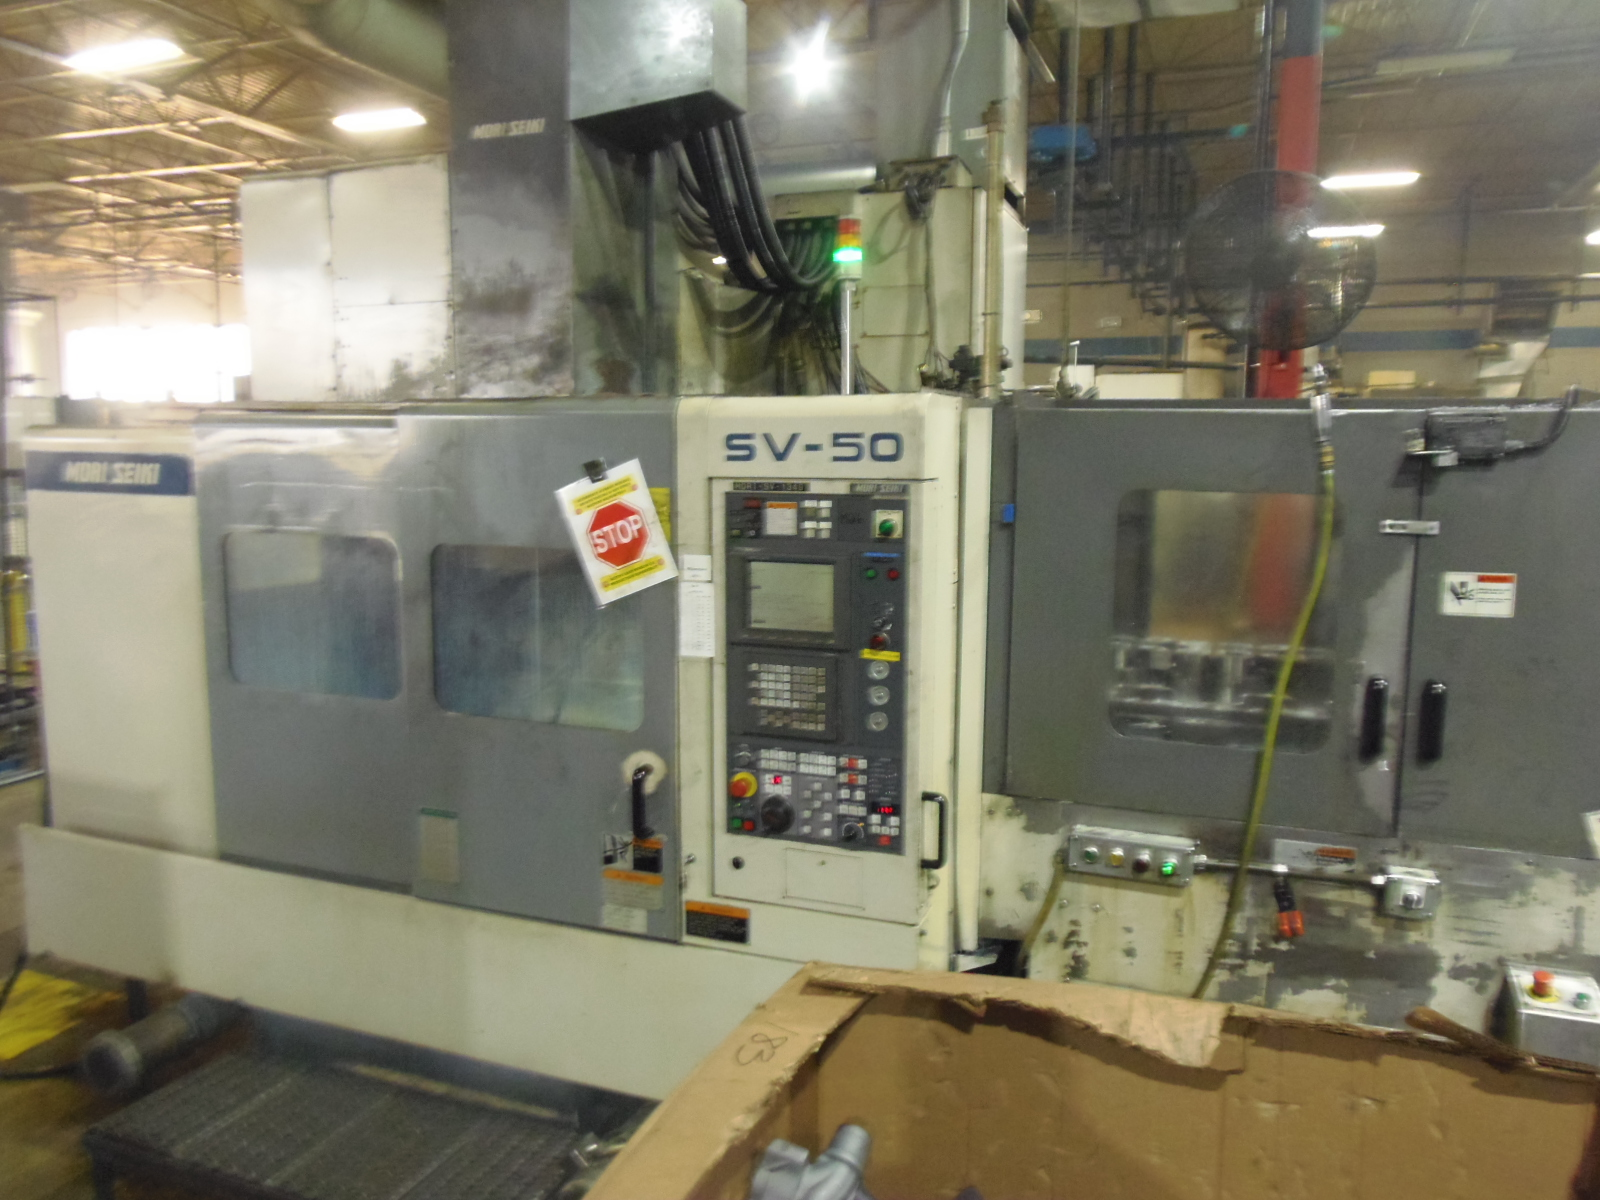 MORI SEIKI SV50B/40, MSC-518 (FANUC 18M)  CONTROL, 10,000 RPM, 30 TOOLS, TSC, PALLET CHANGER, 1997